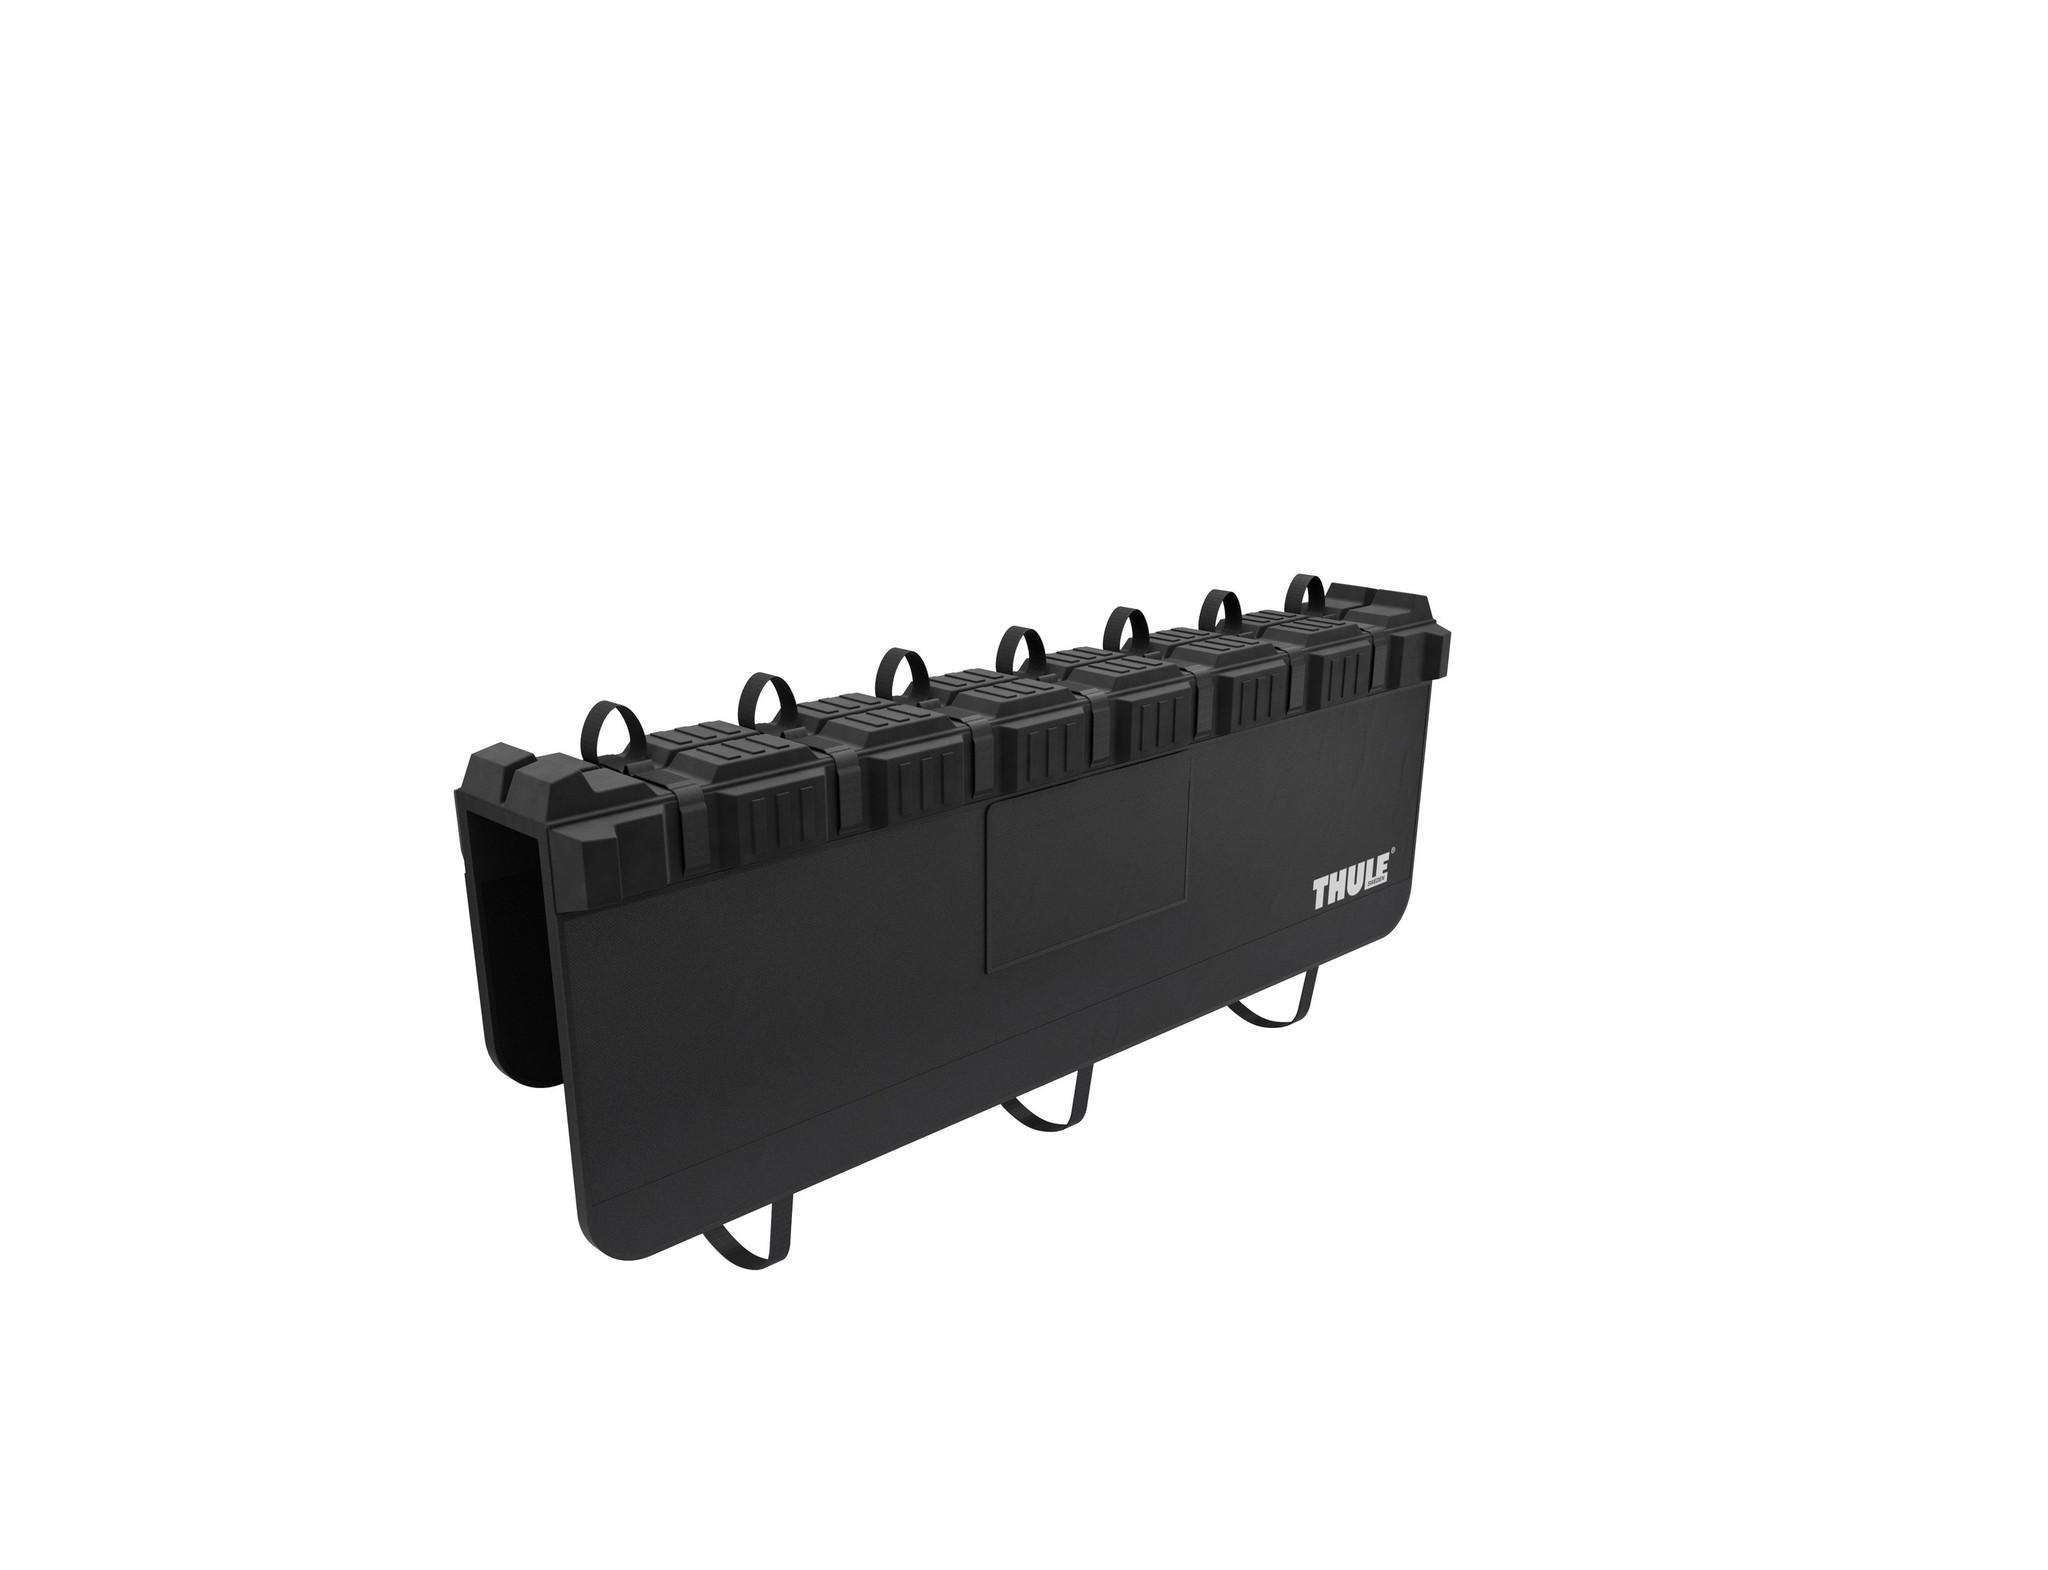 Thule Gate Mate Pro Compact Tailgate Pad